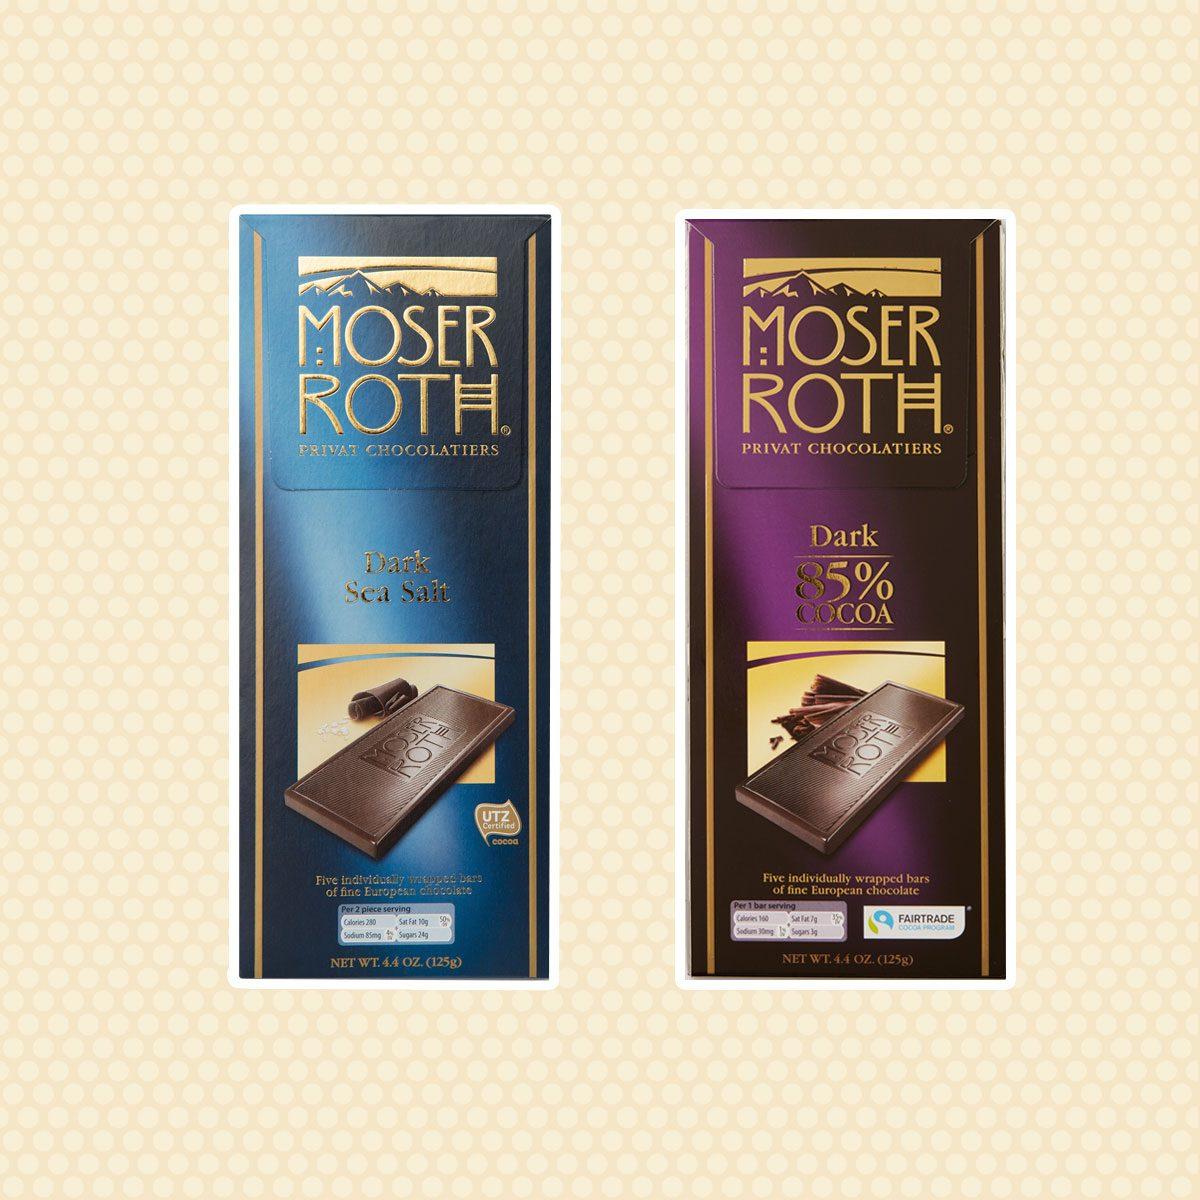 Moser Roth Premium Chocolate